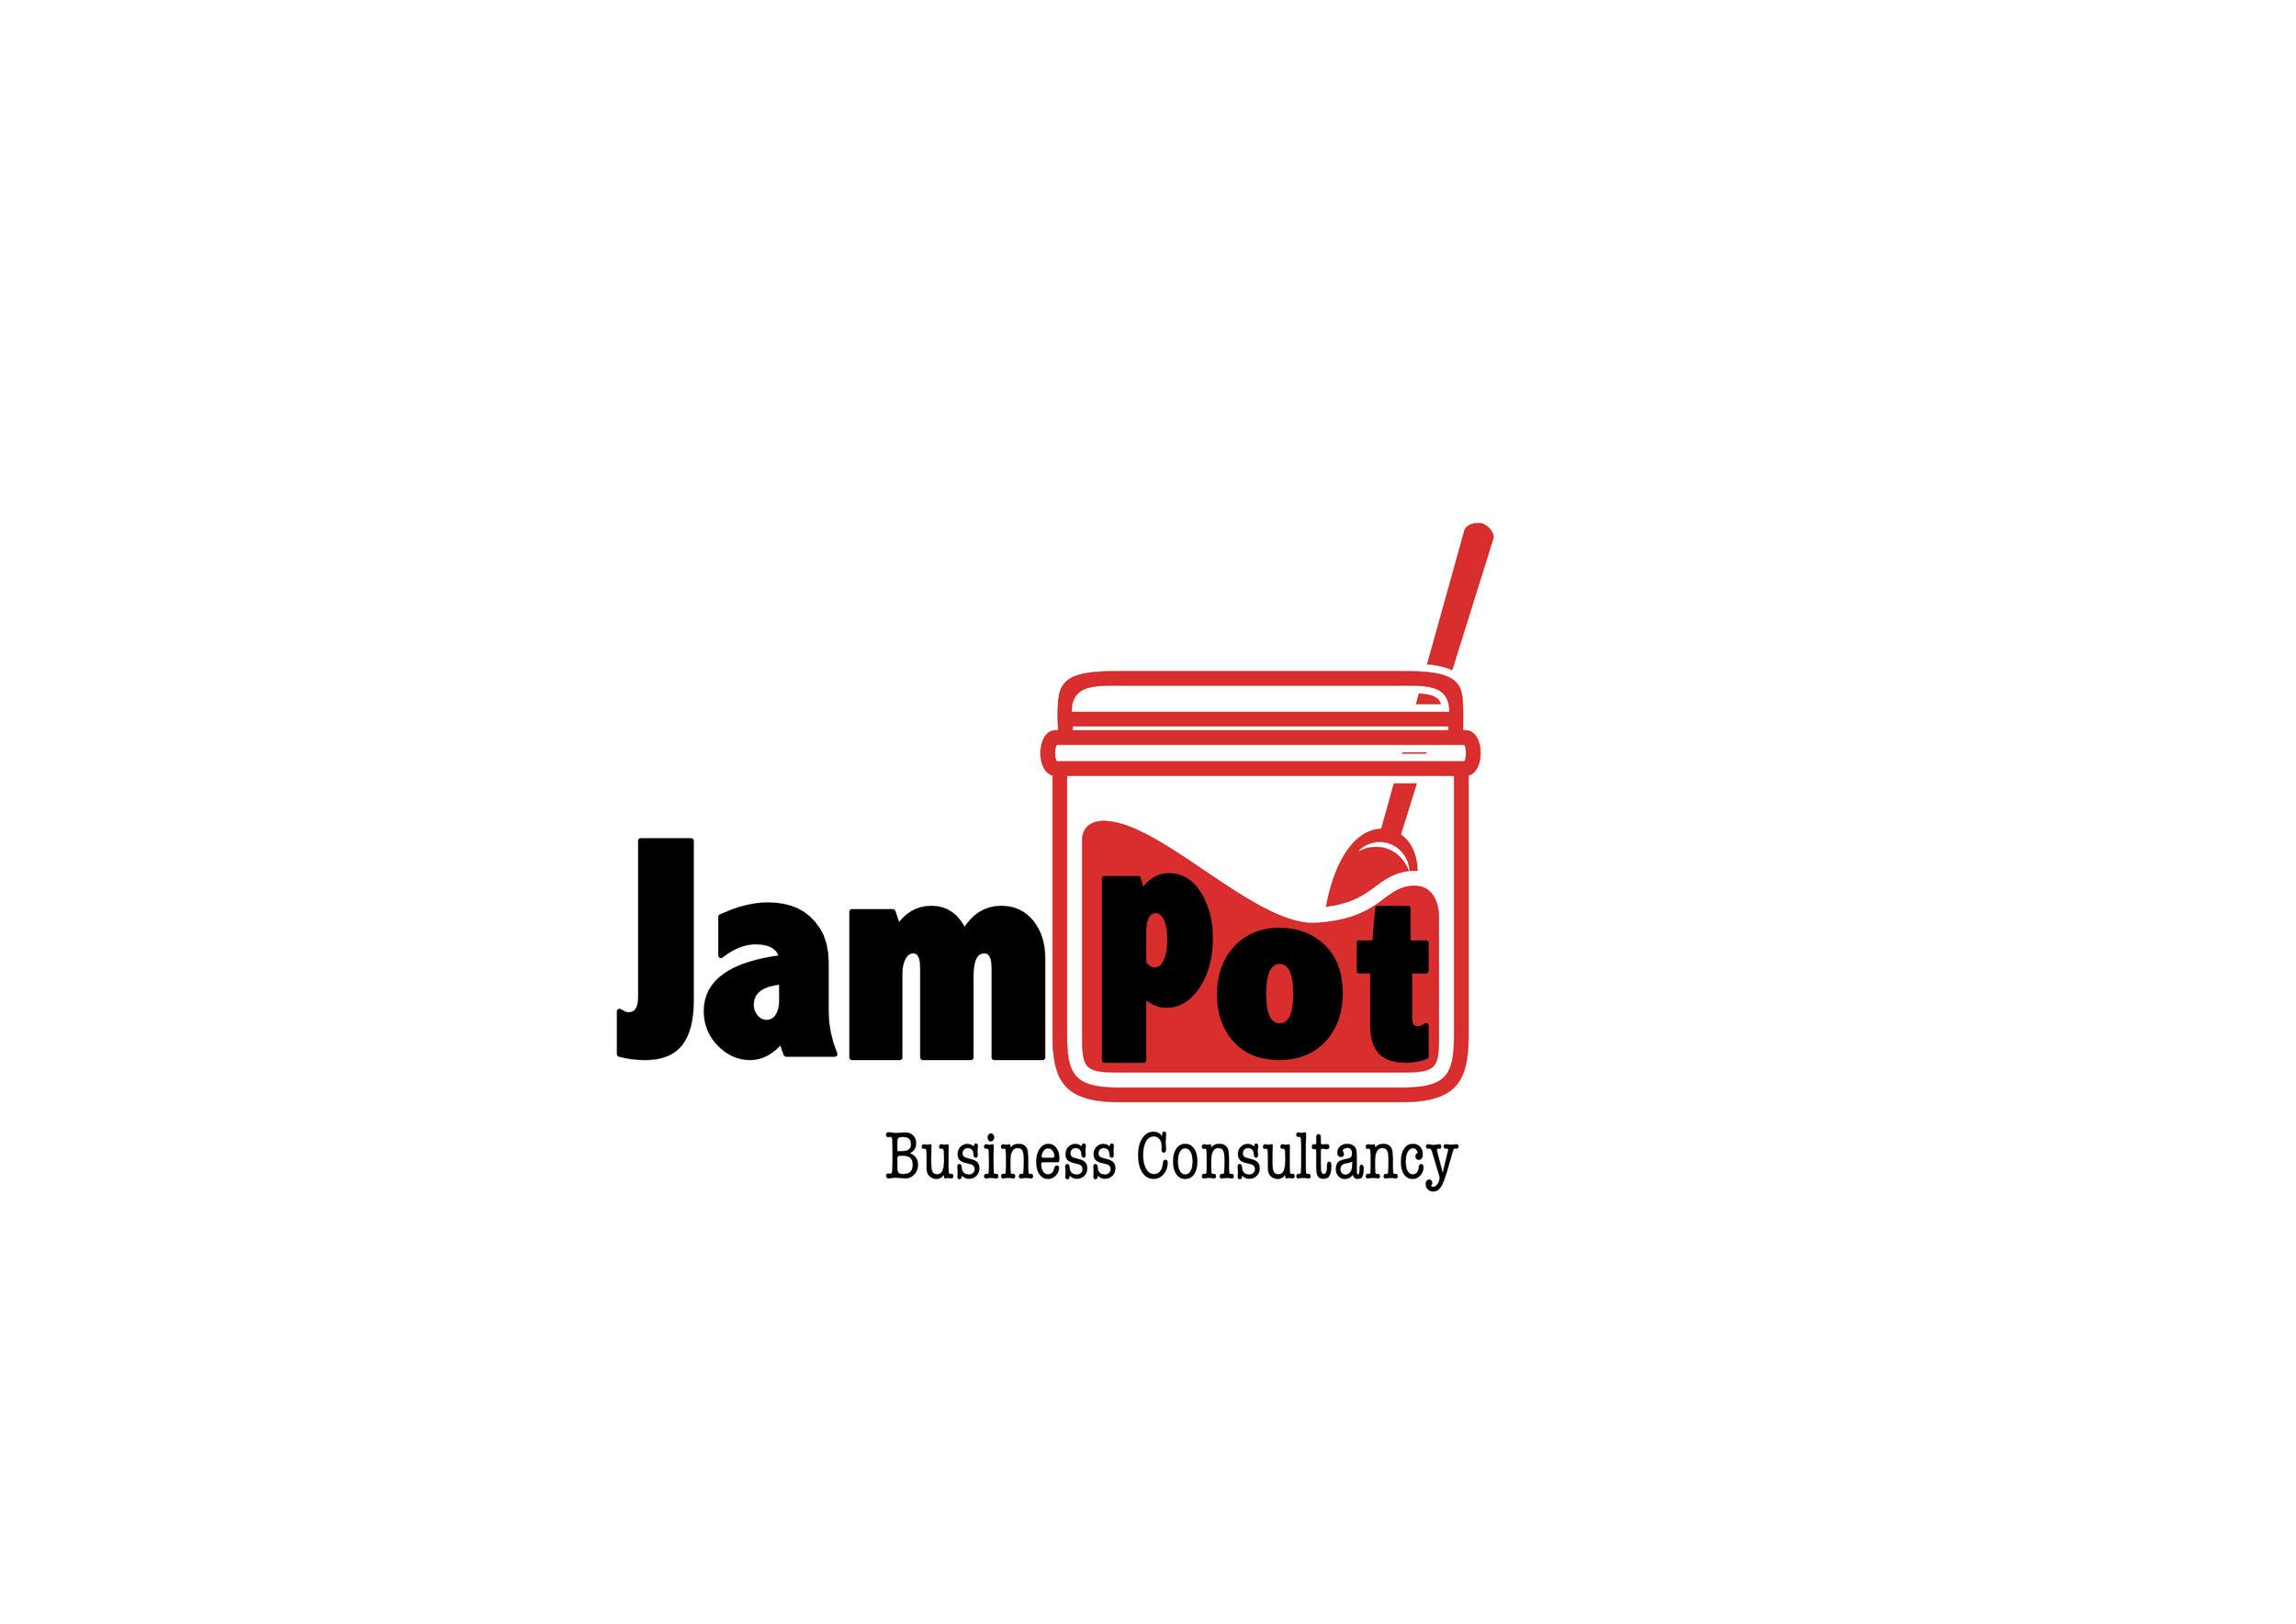 JamPot Business Consultancy Ltd